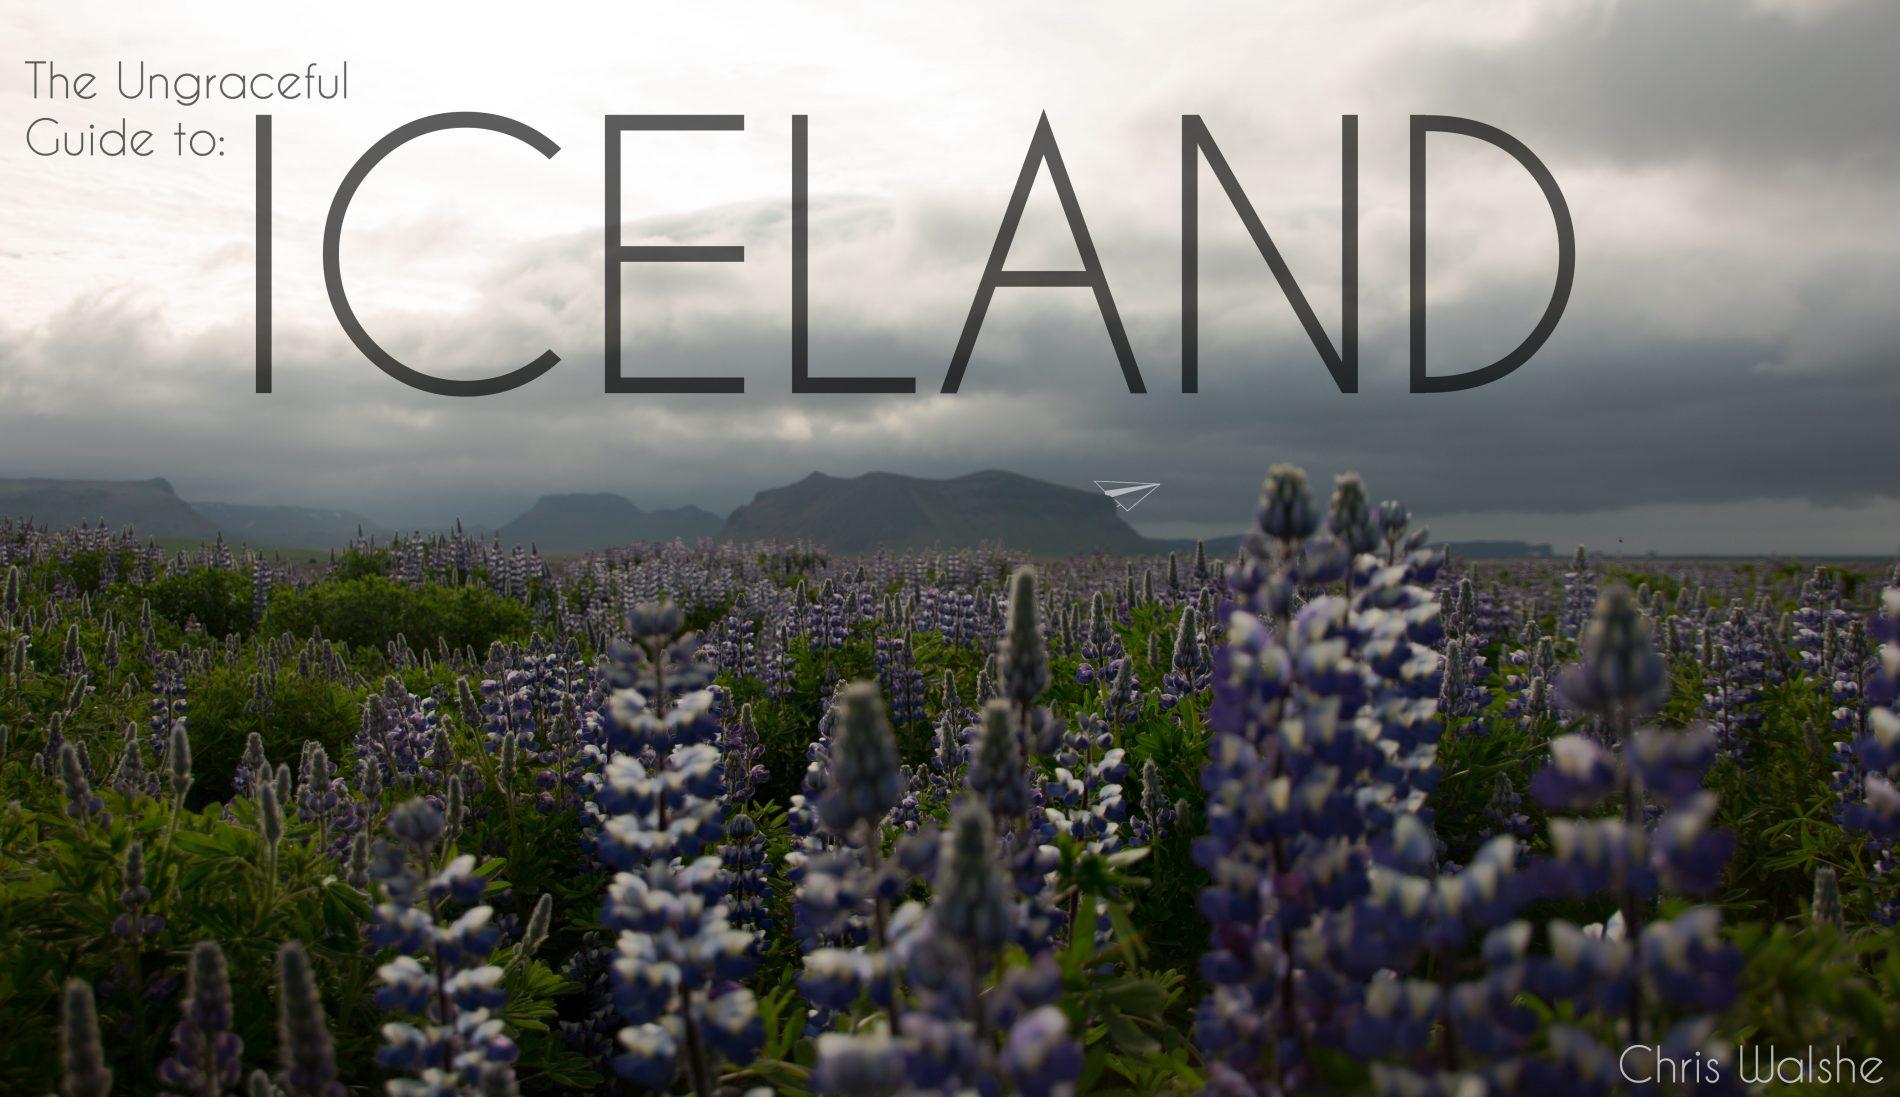 "<img src=""data:image/gif;base64,R0lGODdhAQABAPAAAP///wAAACwAAAAAAQABAEACAkQBADs="" data-lazy-src=""images/"" width=""800"" height=""600"" alt=""iceland - ICELAND - Iceland: How to get the most on a budget"">"